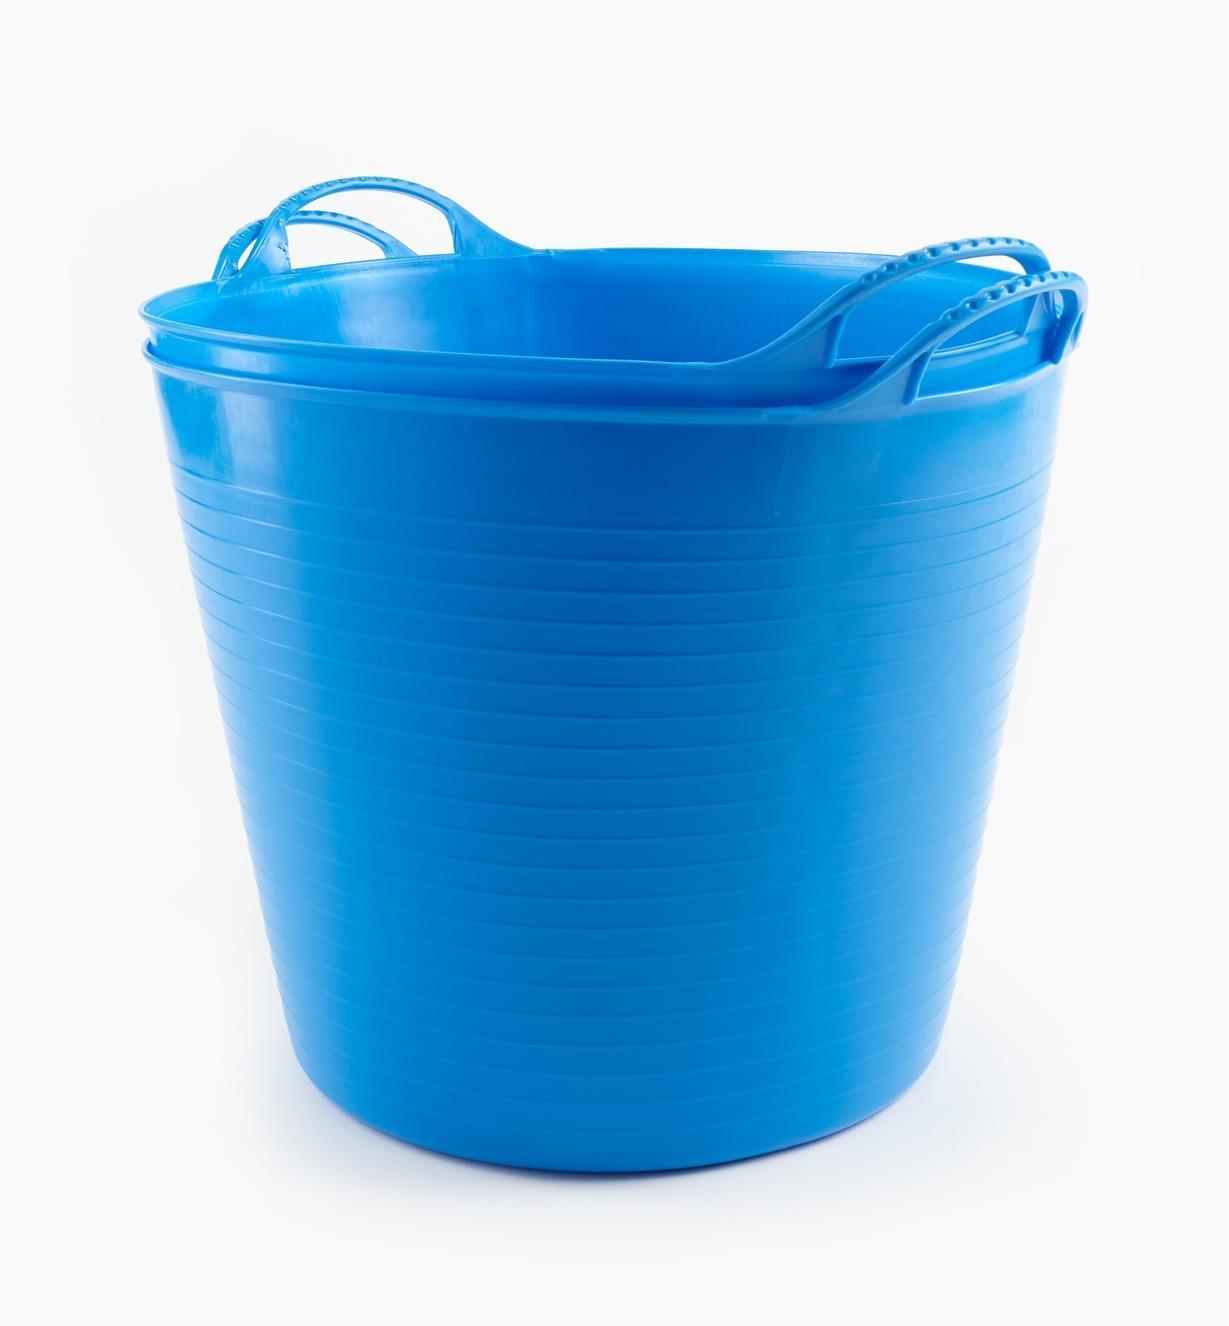 WT640 - 26l Blue Tubs, pair